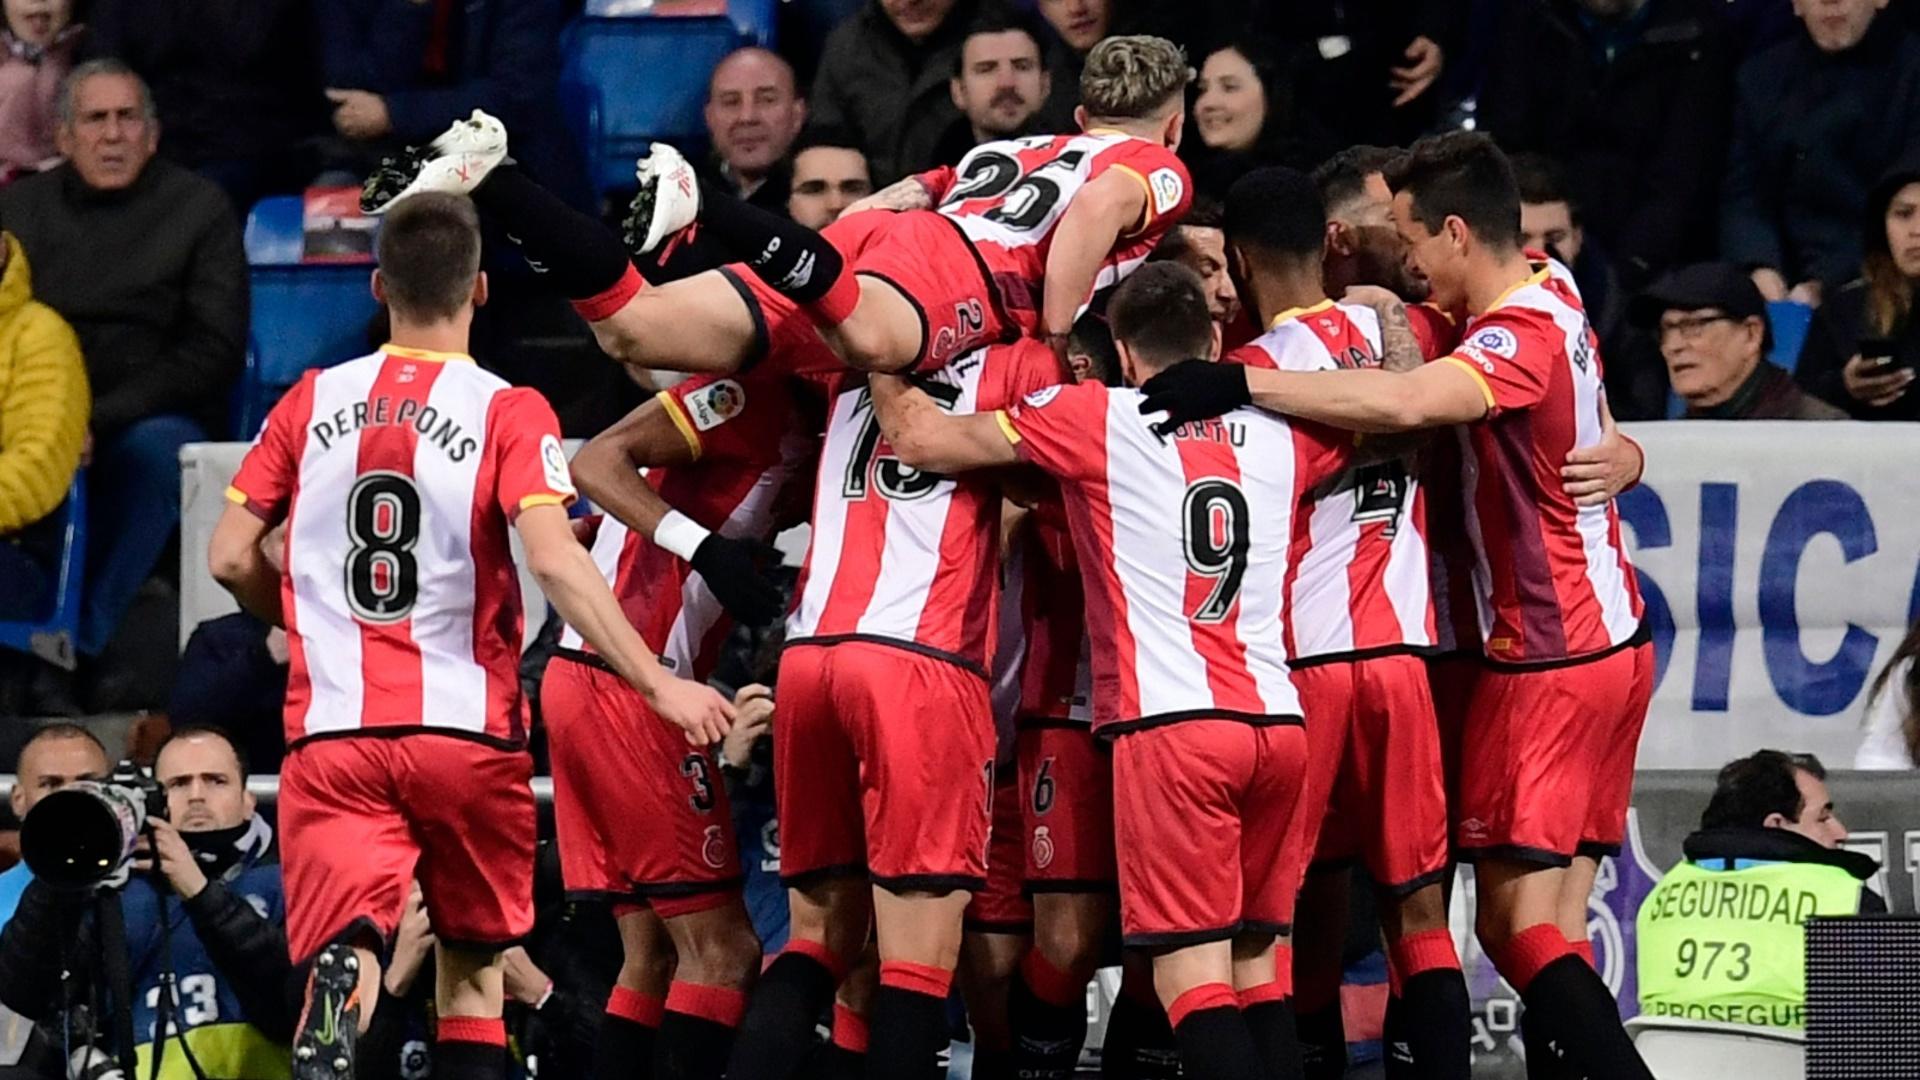 Jogadores do Girona comemoram gol de Stuani contra o Real